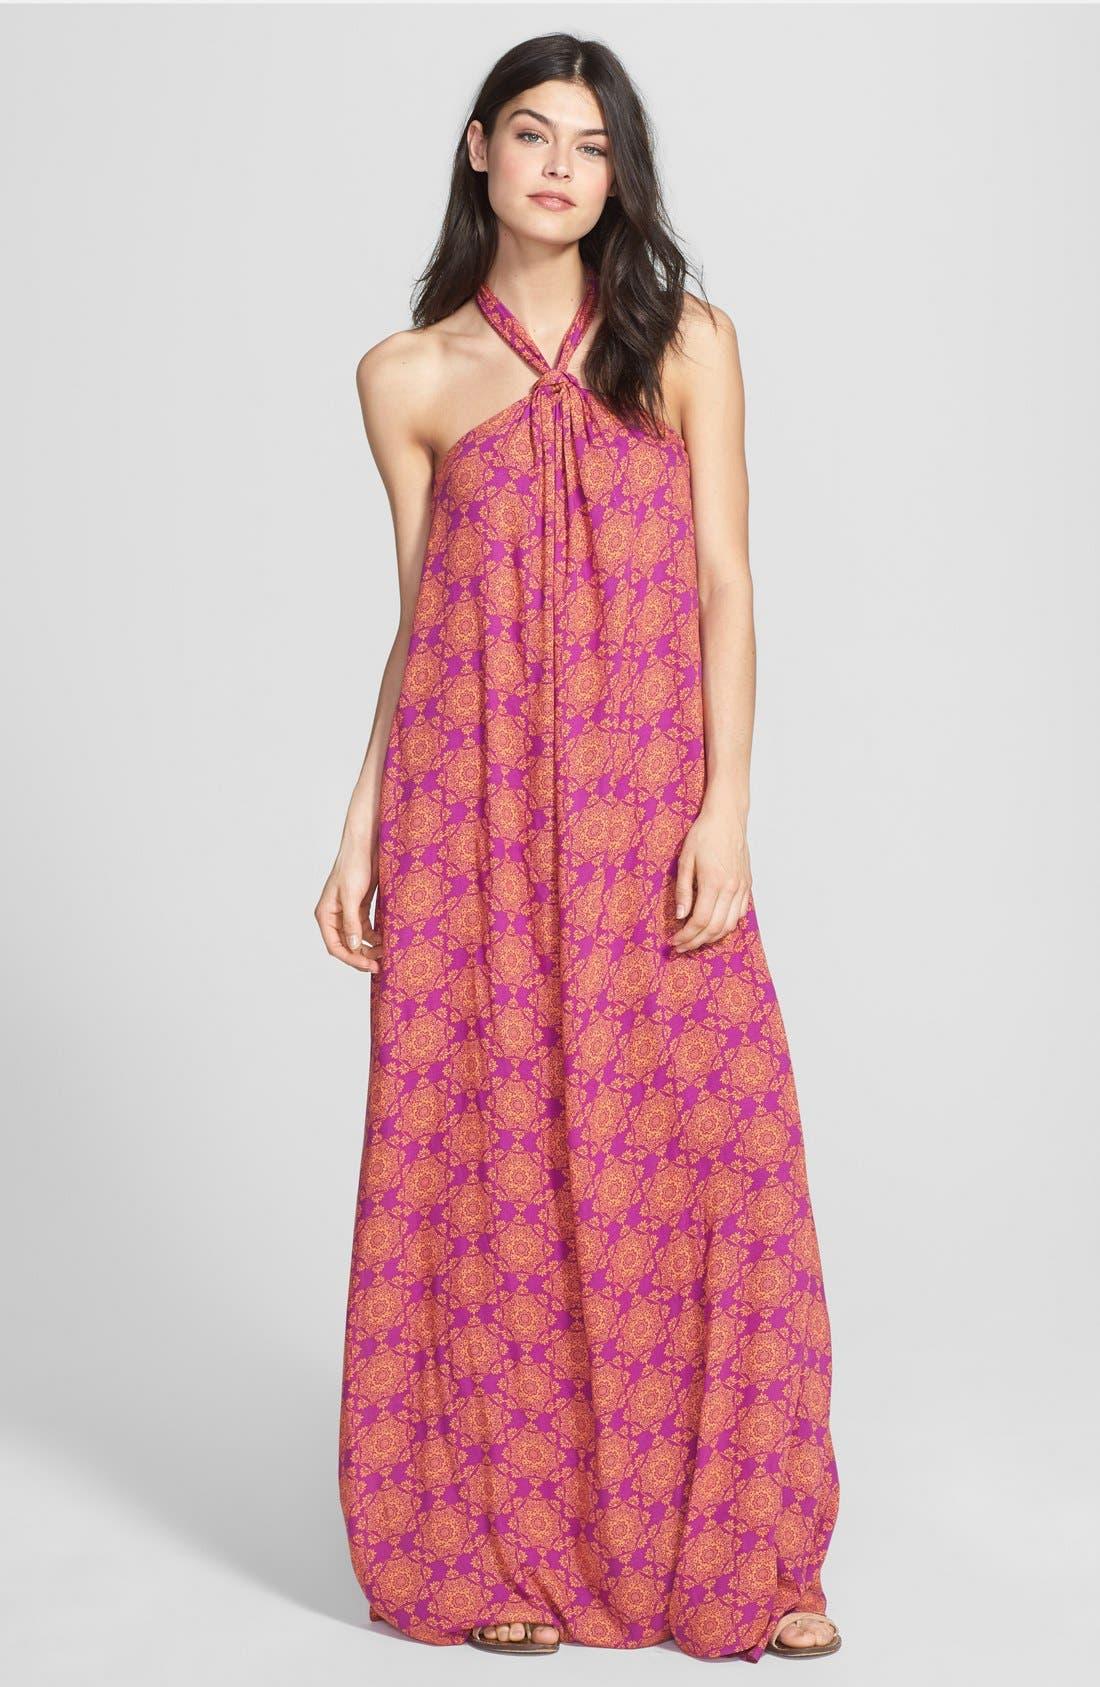 Alternate Image 1 Selected - Ella Moss 'Moselle' Print Halter Maxi Dress